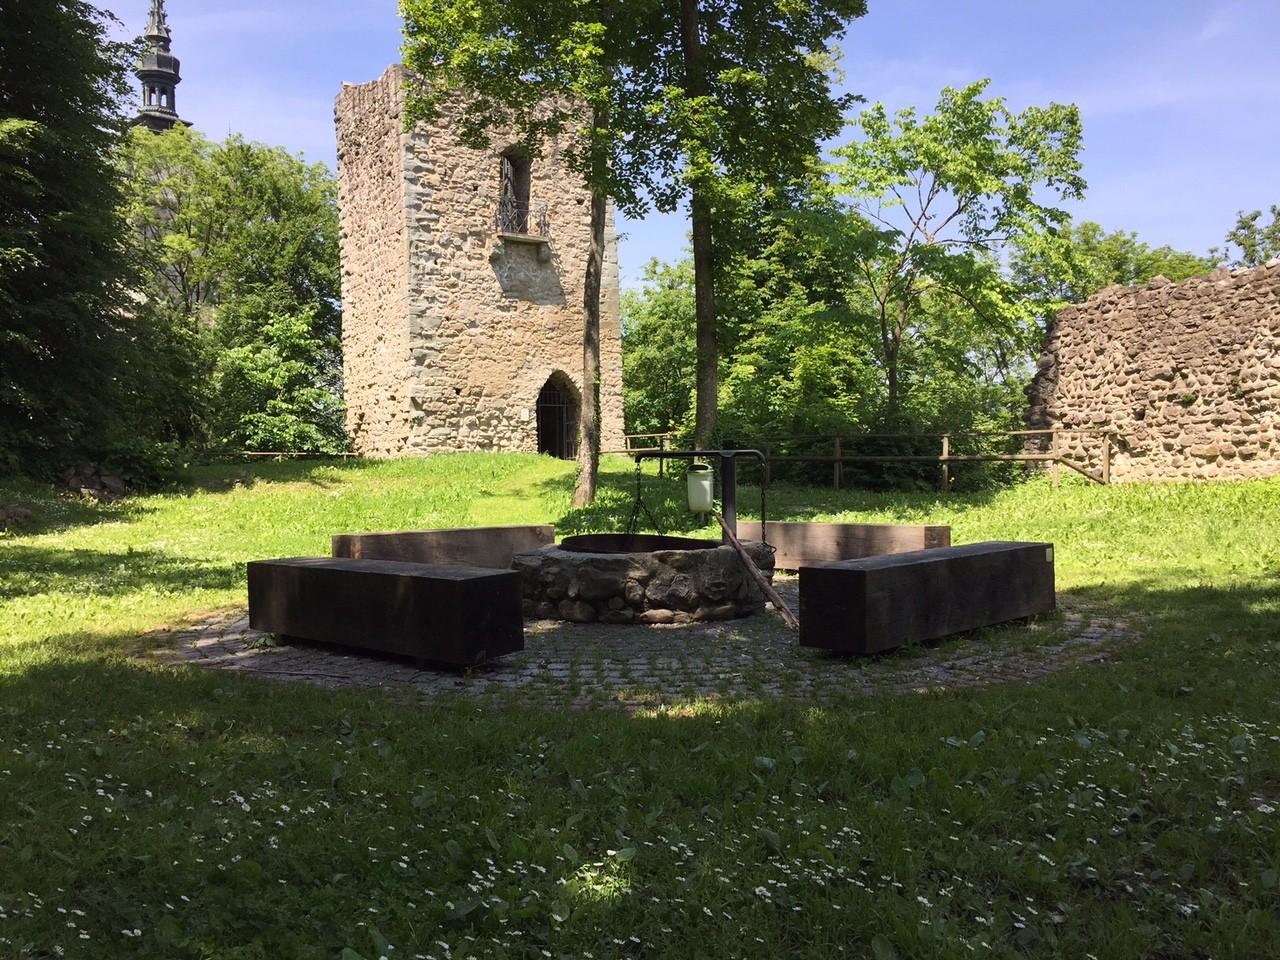 Ausflugsziel: Ruine Castell Tägerwilen